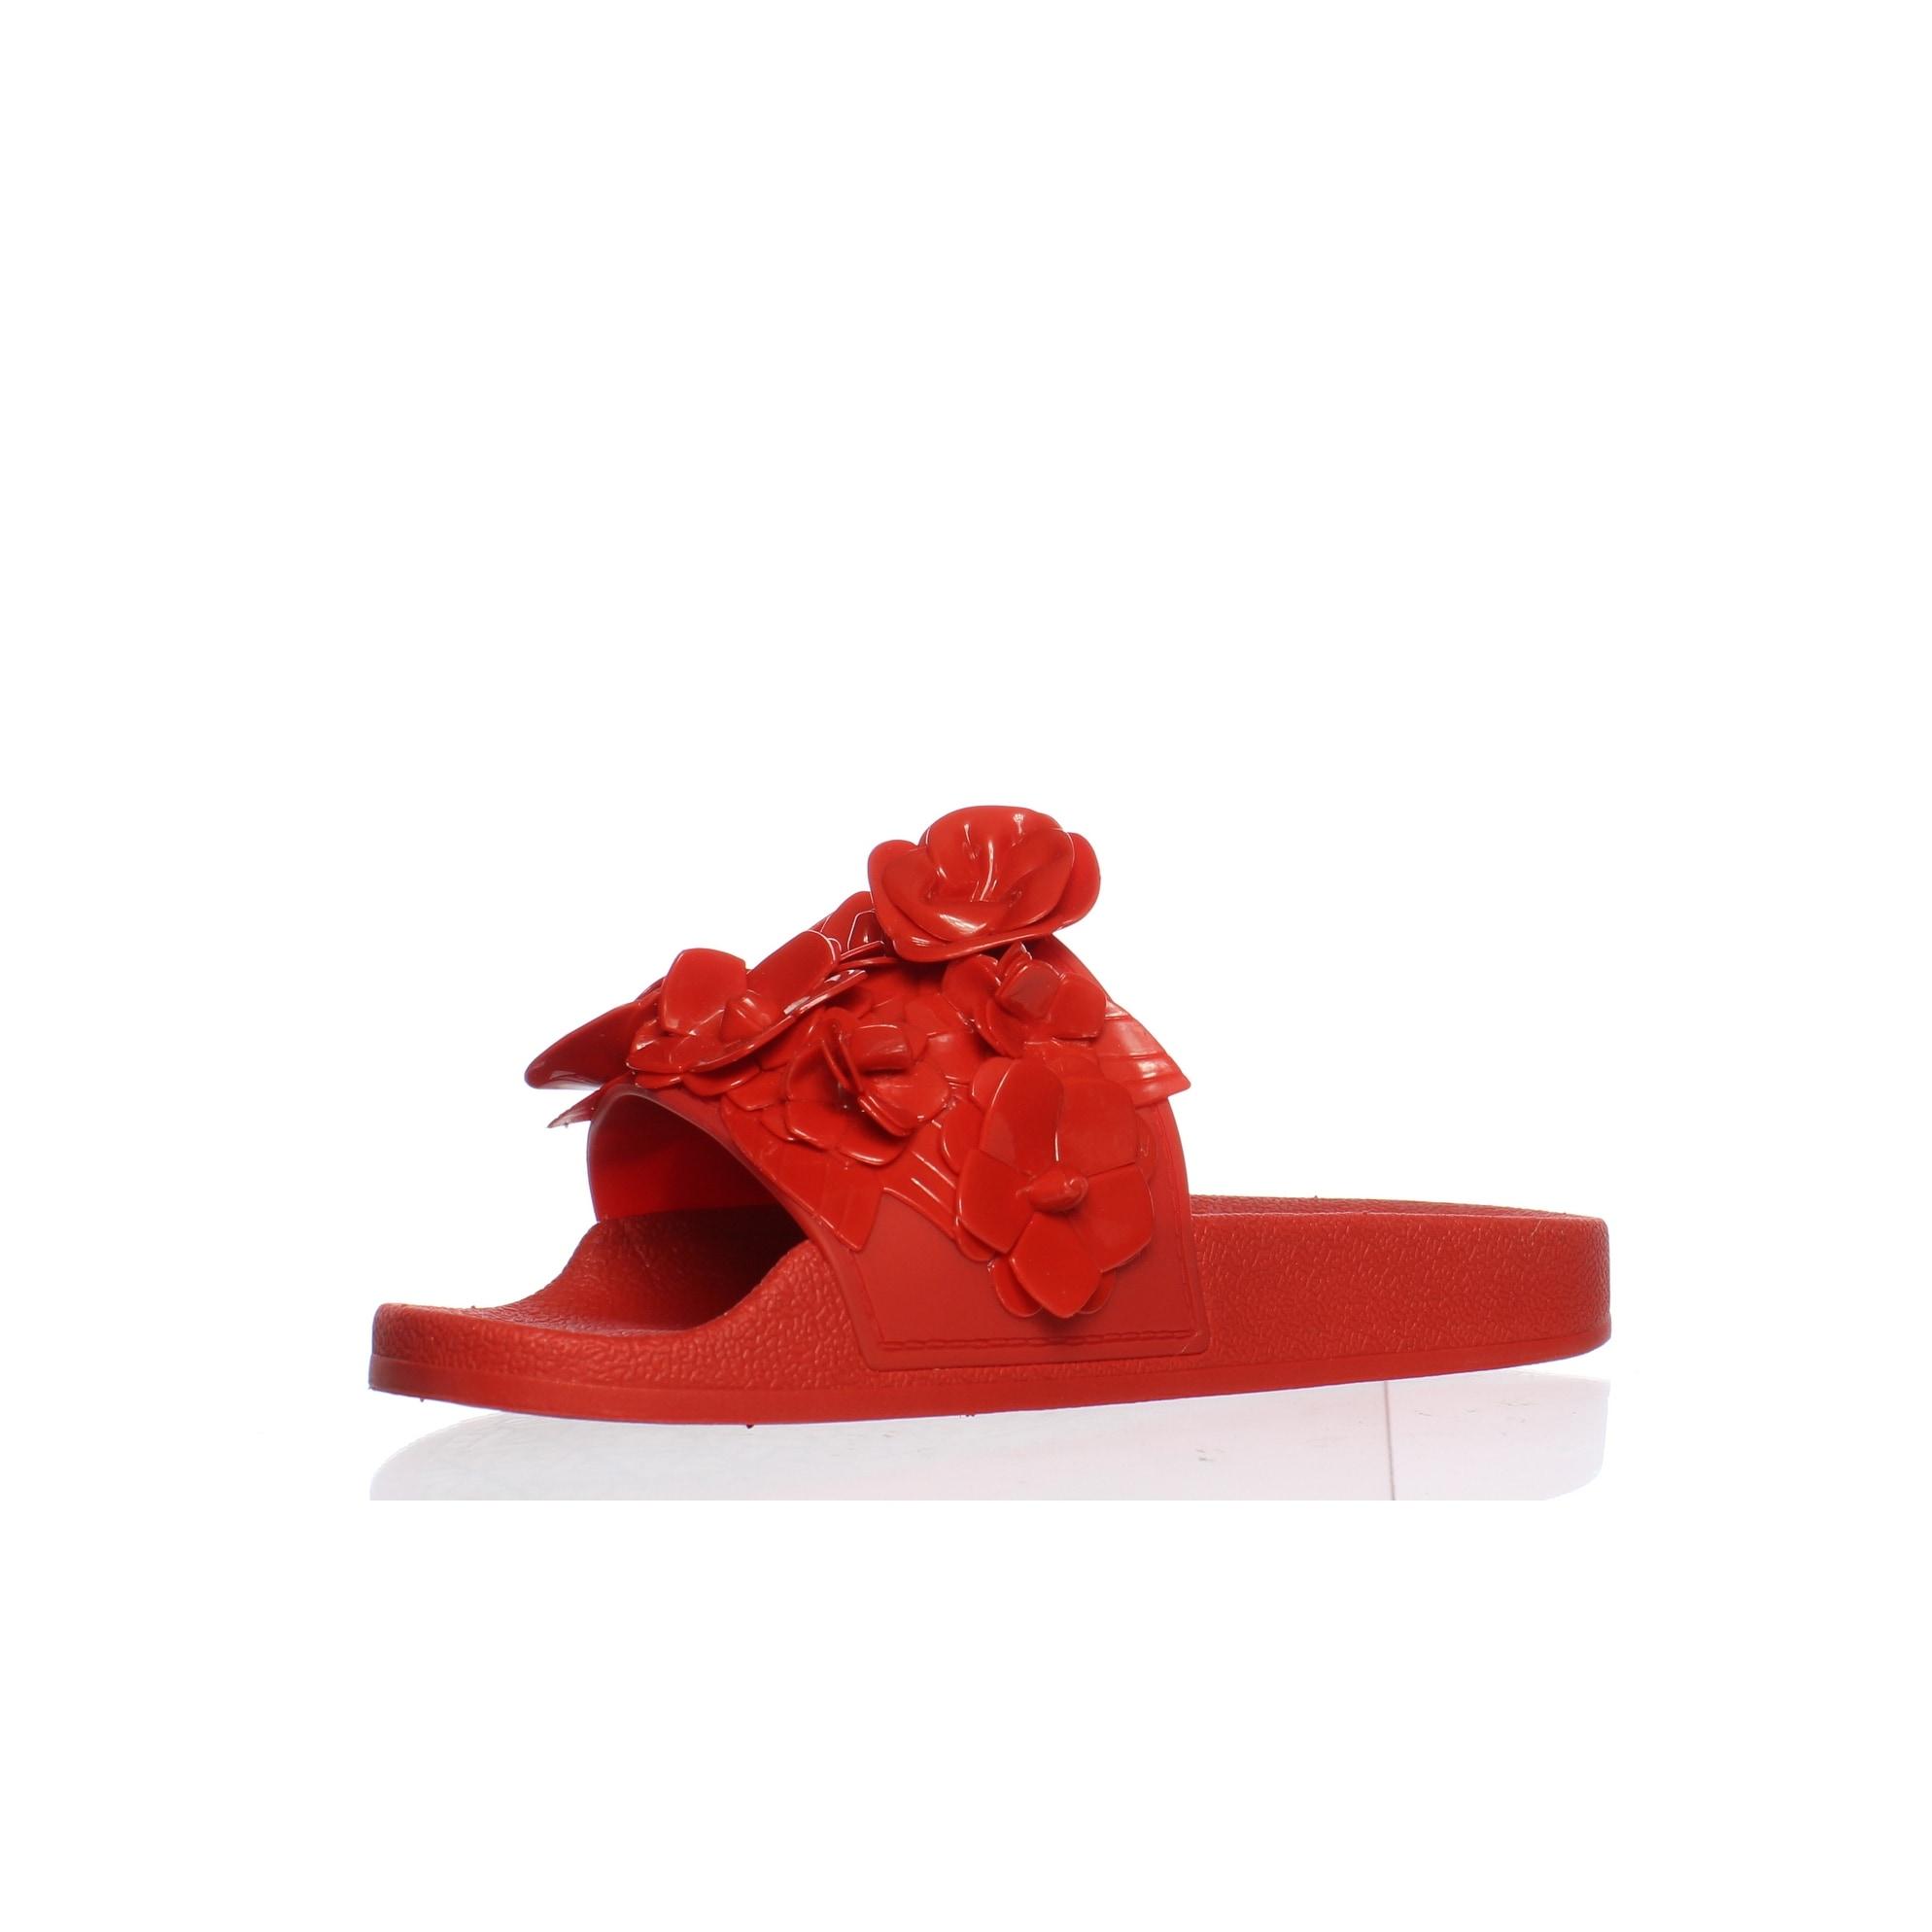 51bc200b767b Shop Tory Burch Womens Blossoms Red Volcano Slides Size 6 - Free ...